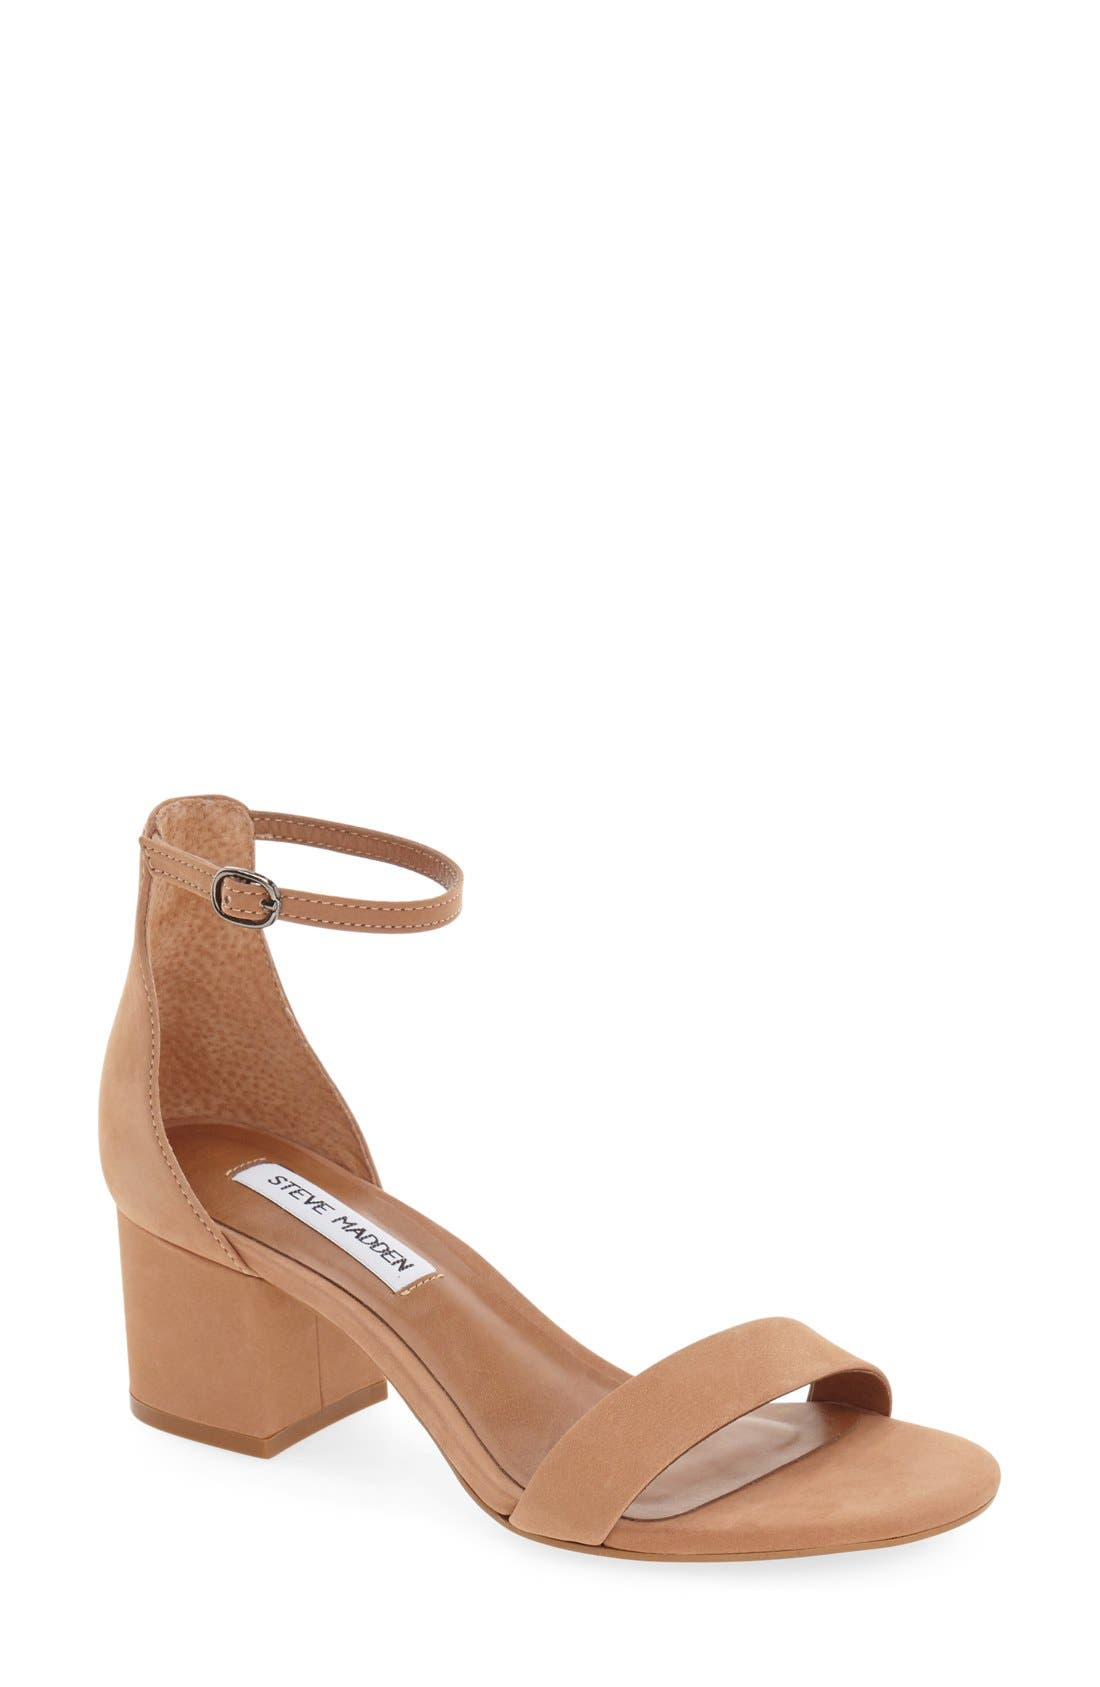 Irenee Ankle Strap Sandal,                         Main,                         color, Tan Nubuck